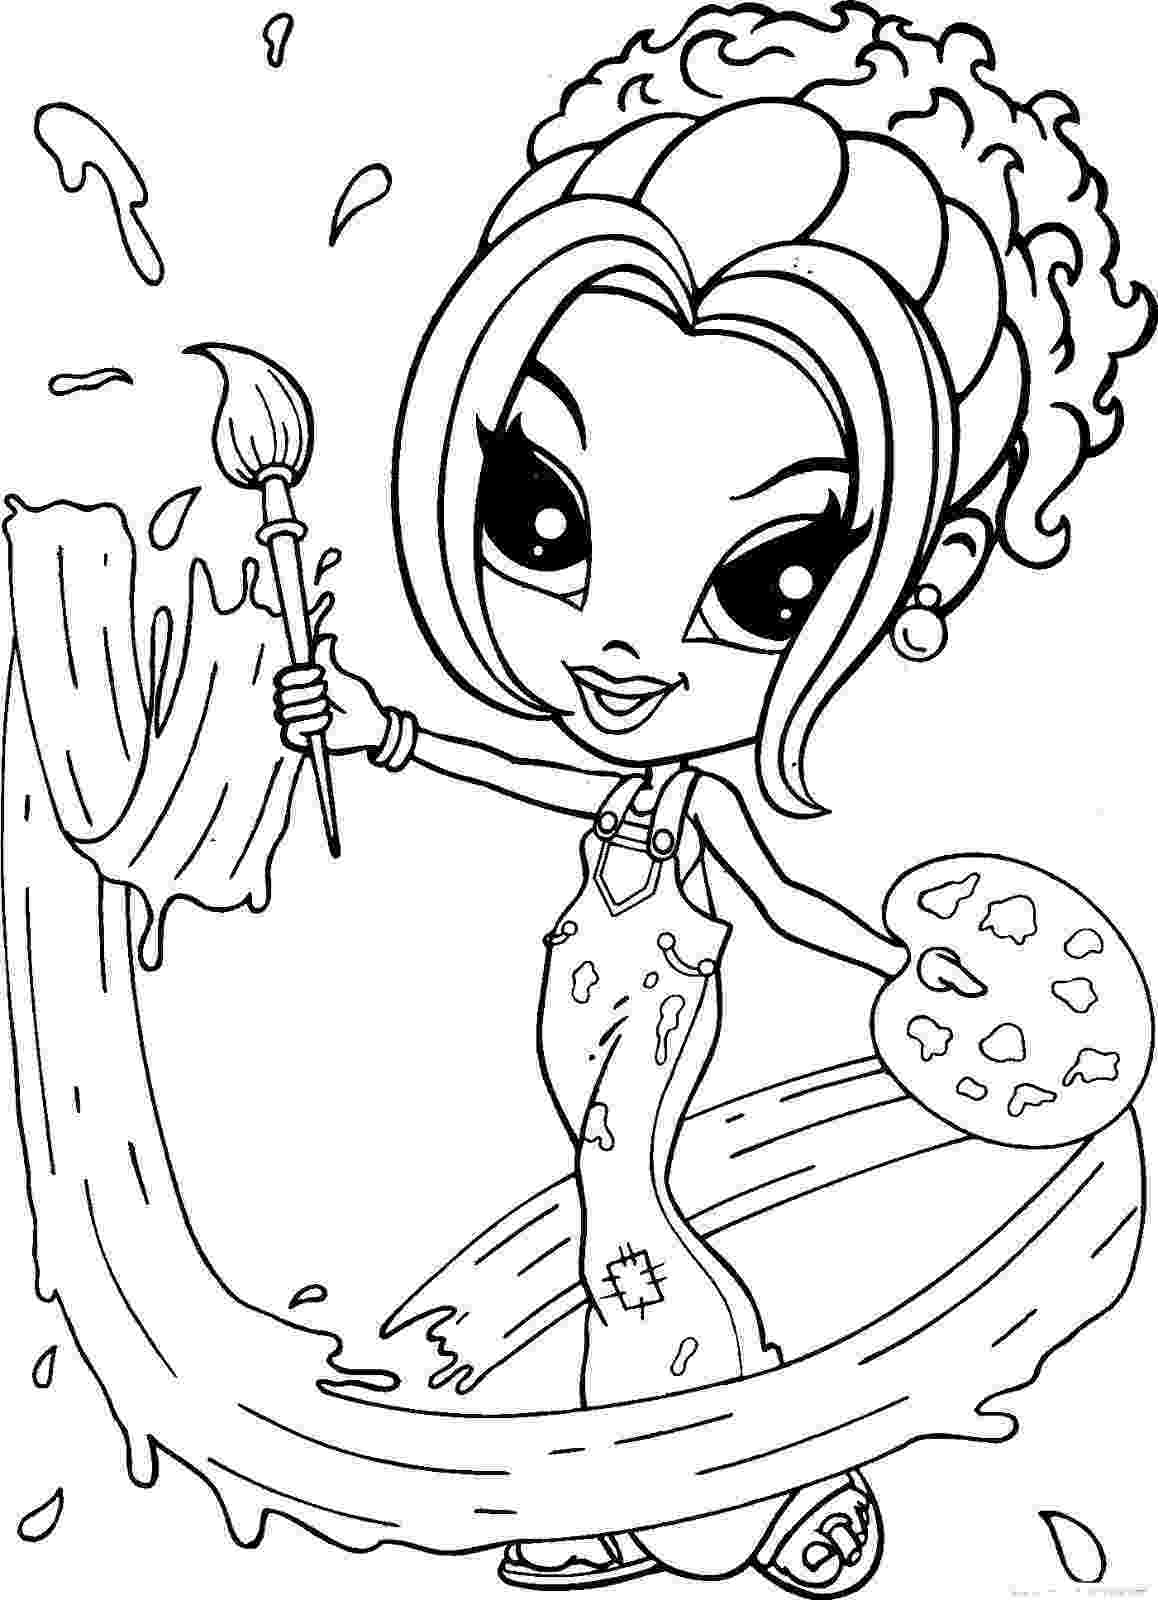 free printable coloring princess coloring pages best coloring pages for kids free coloring printable